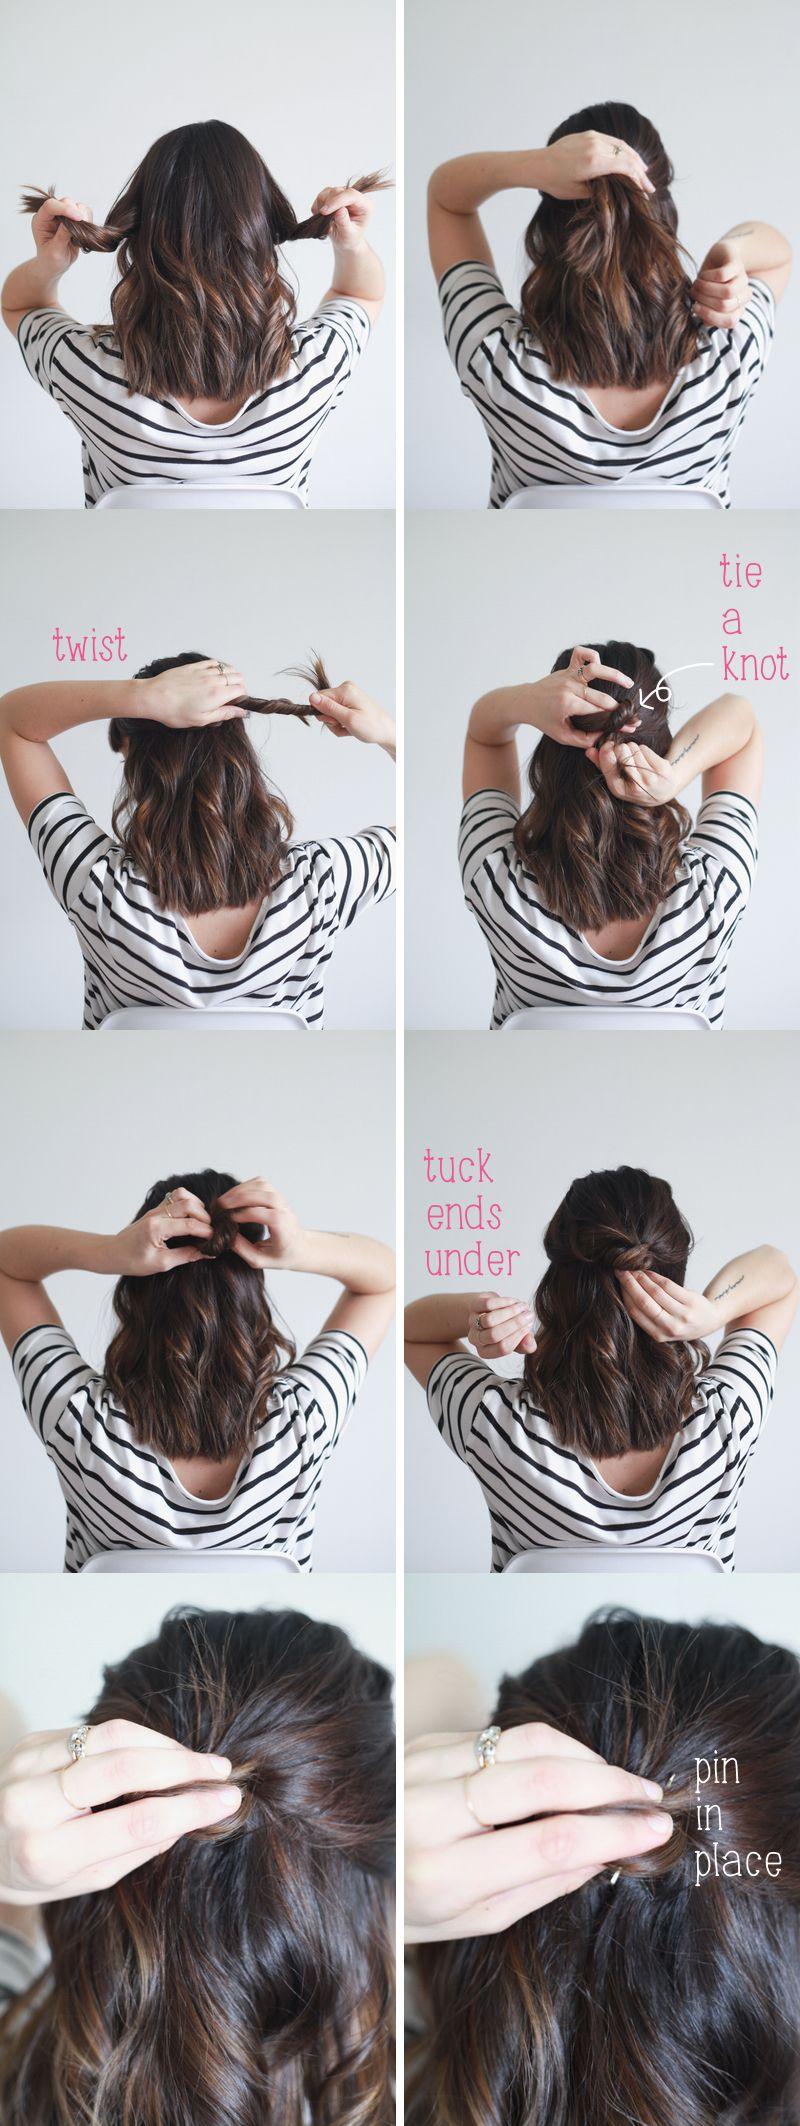 Hair tutorial half up knot in easy steps tutorials hair